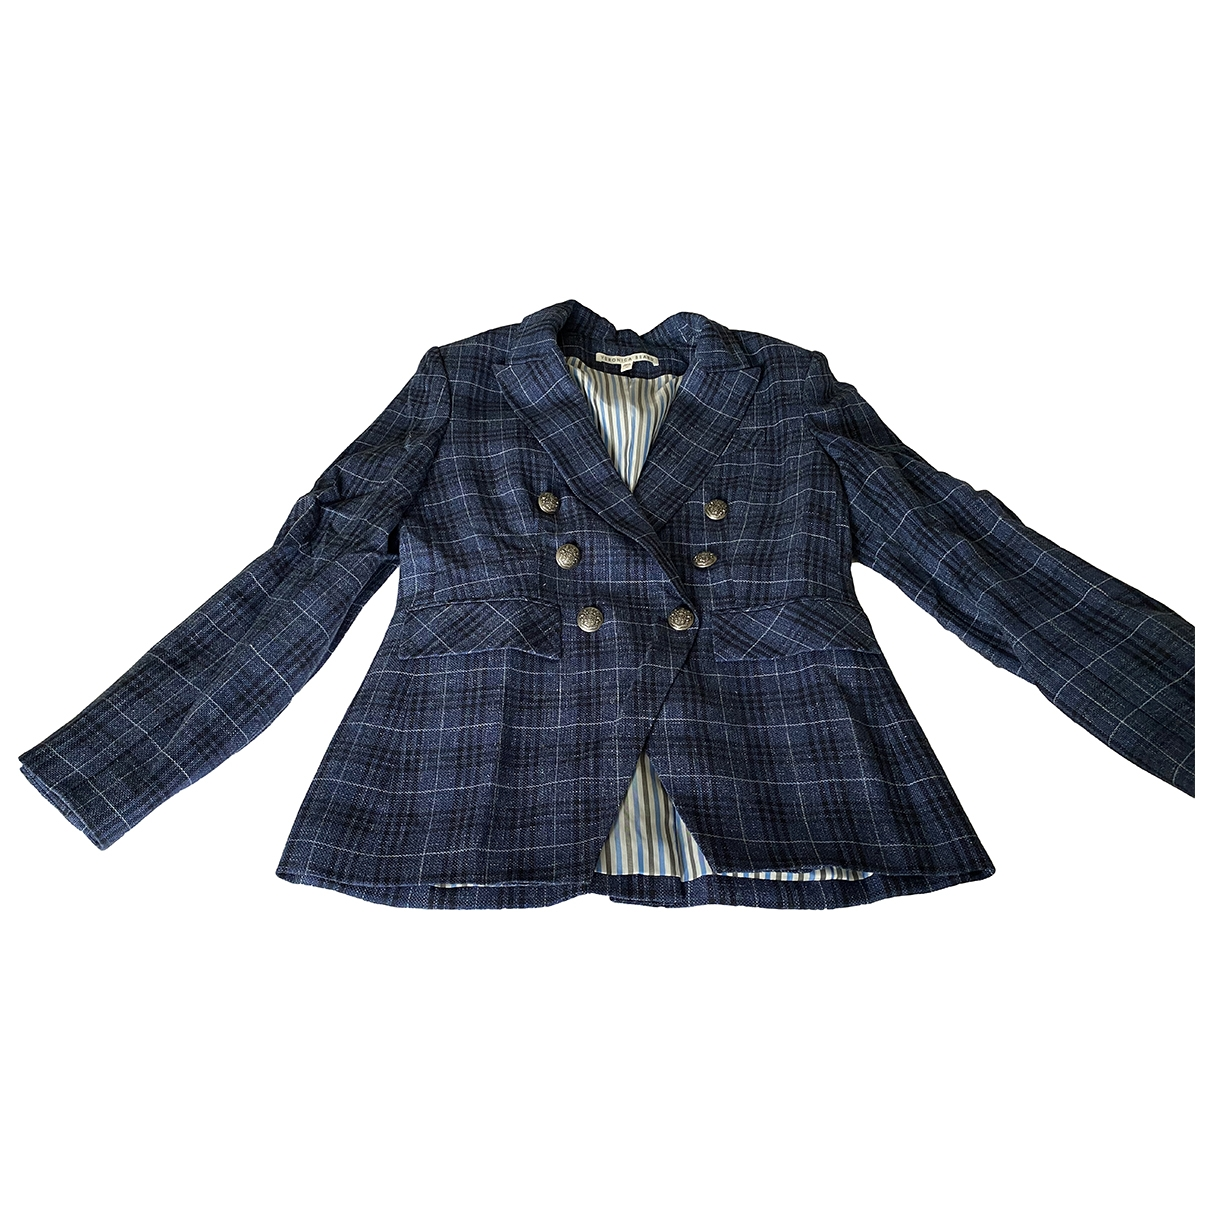 Veronica Beard \N Blue Wool jacket for Women 12 US